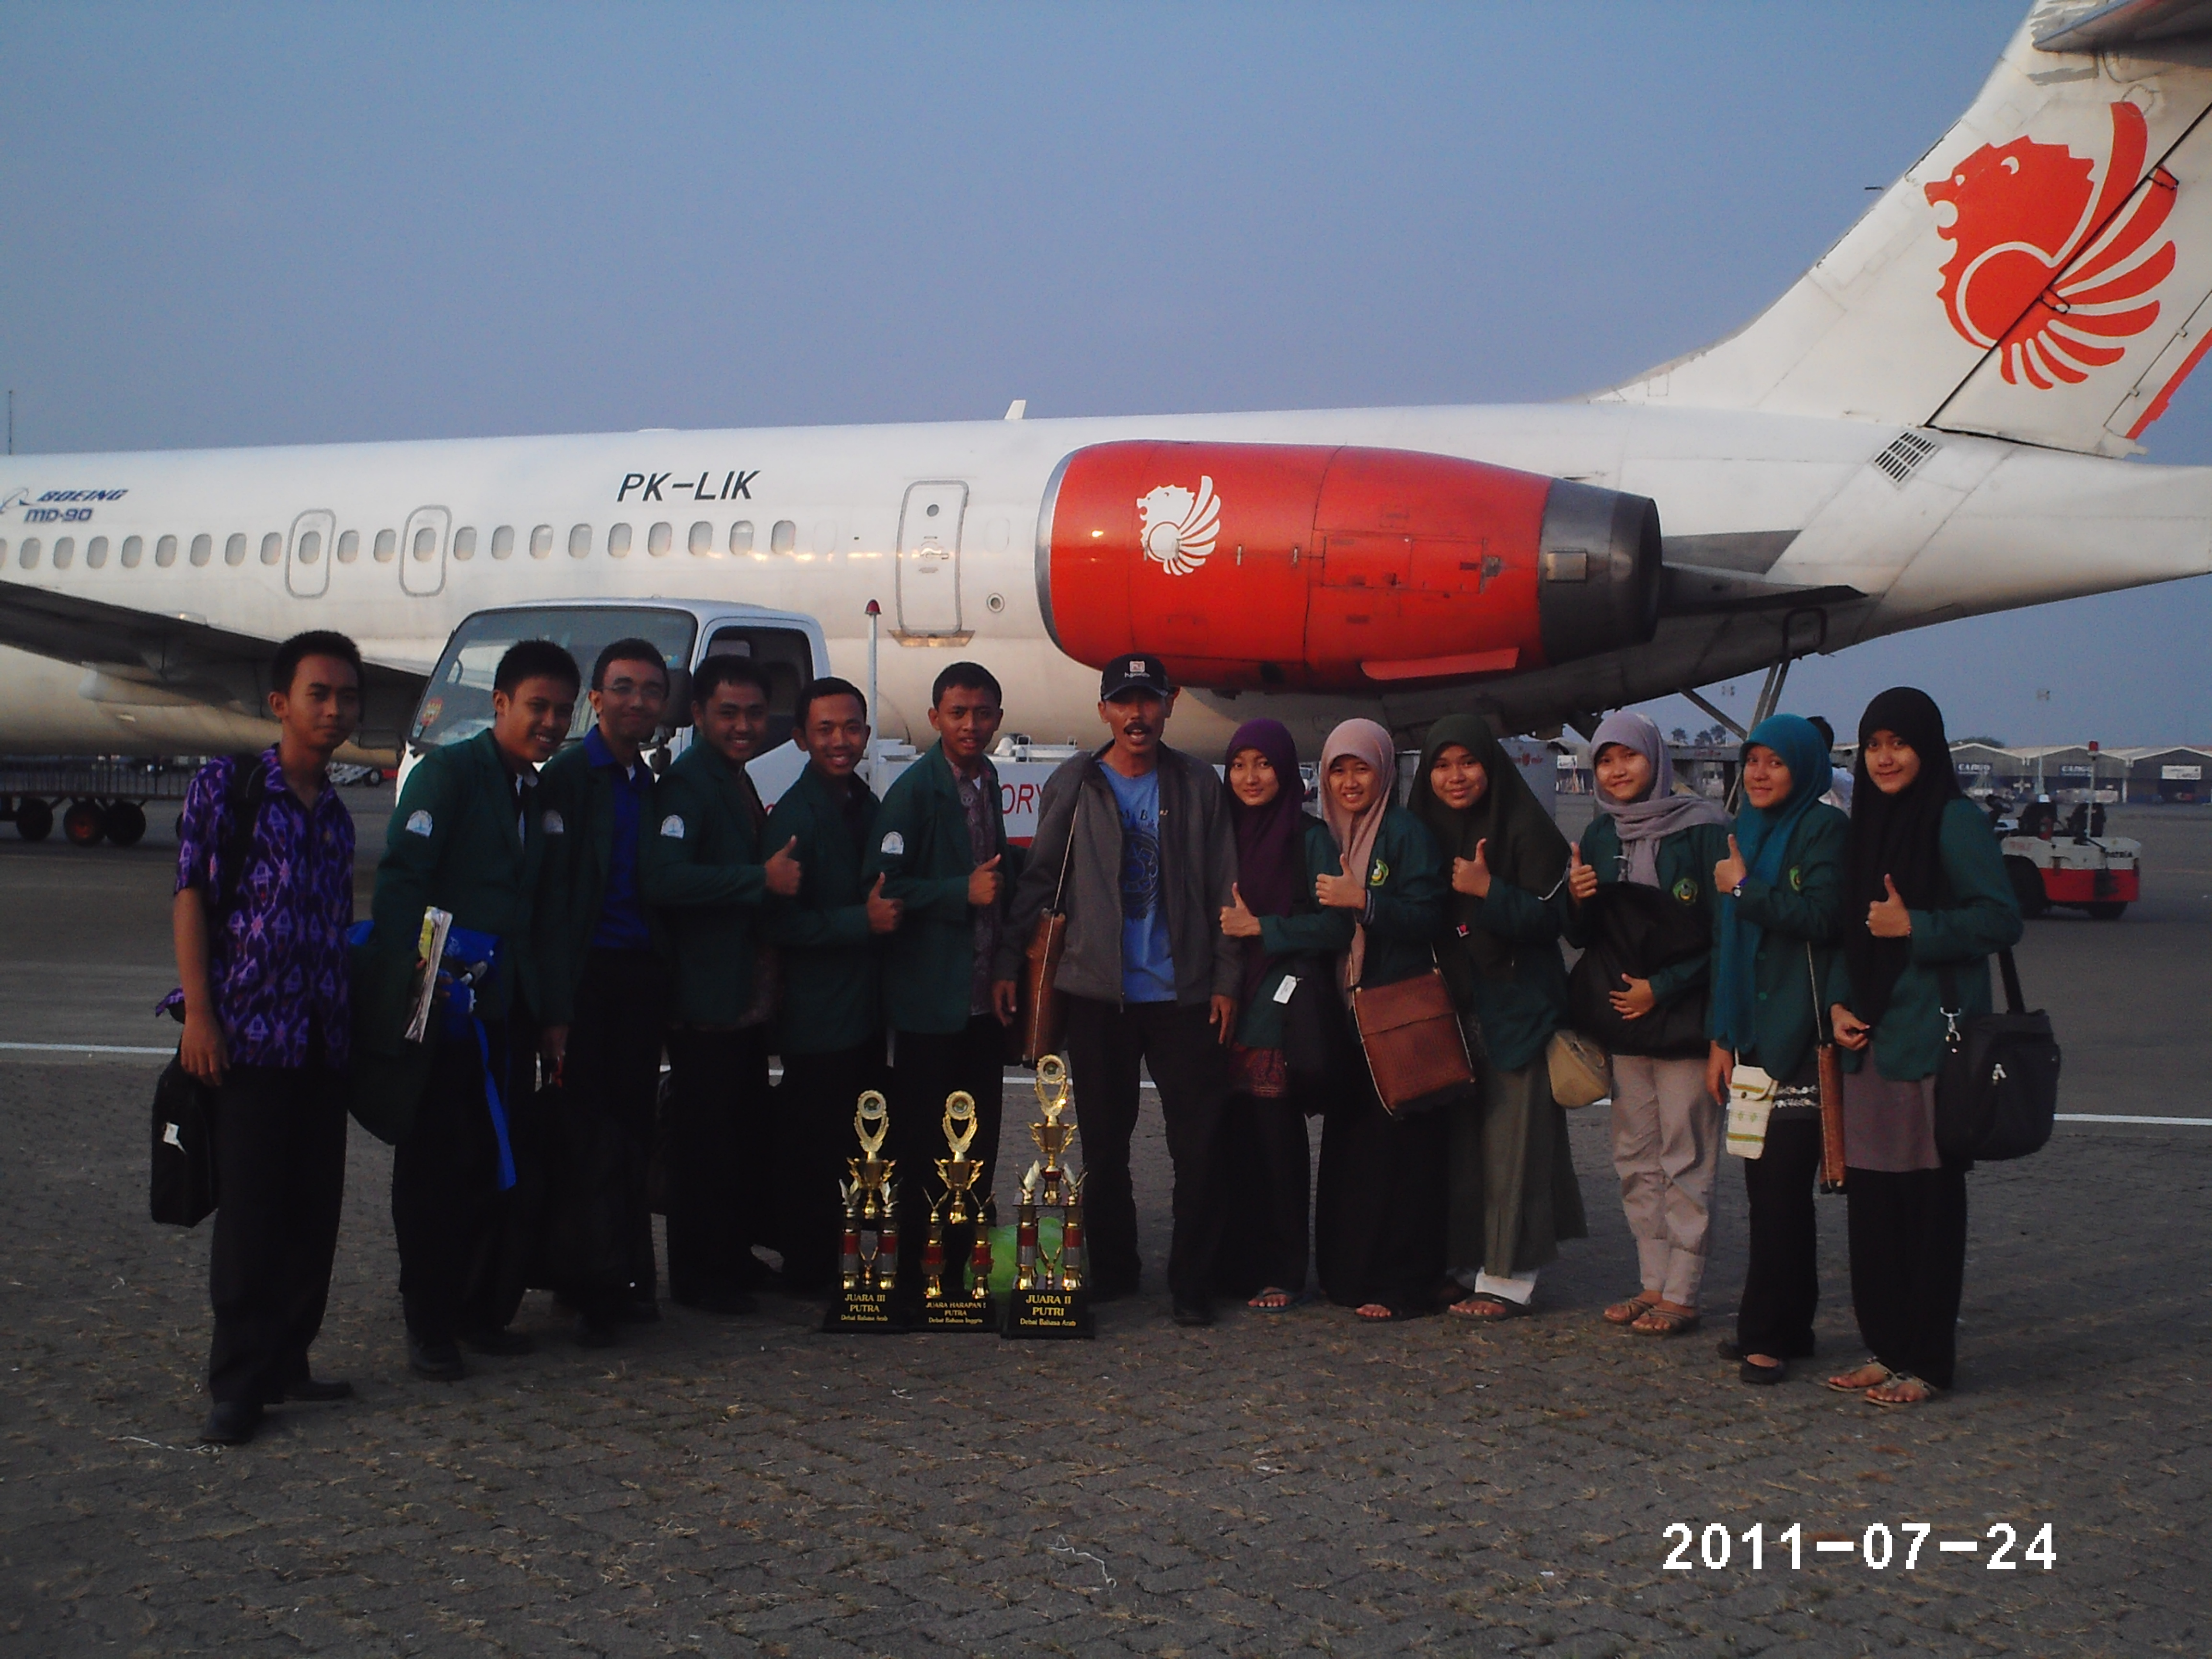 juara-2-lomba-debat-bhs-inggris-arab-lombok.jpg